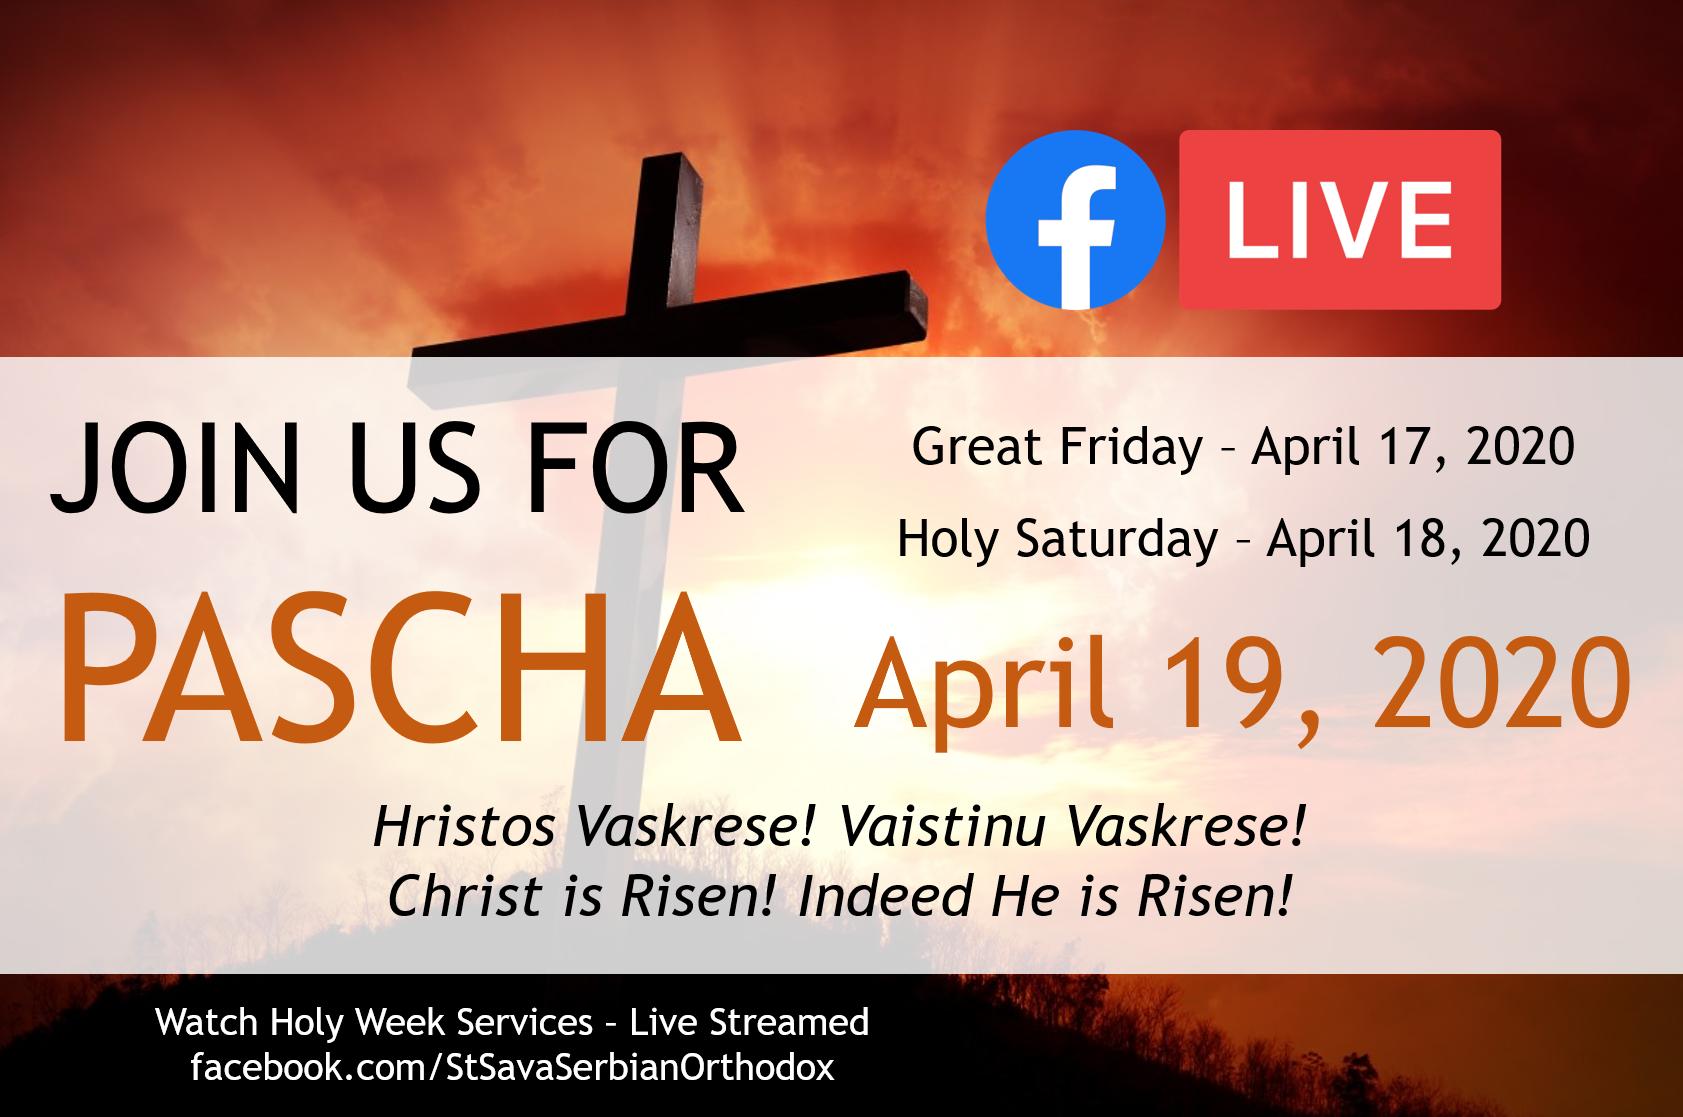 Pascha/Easter Holy Week - St. Sava Serbian Orthodox Church